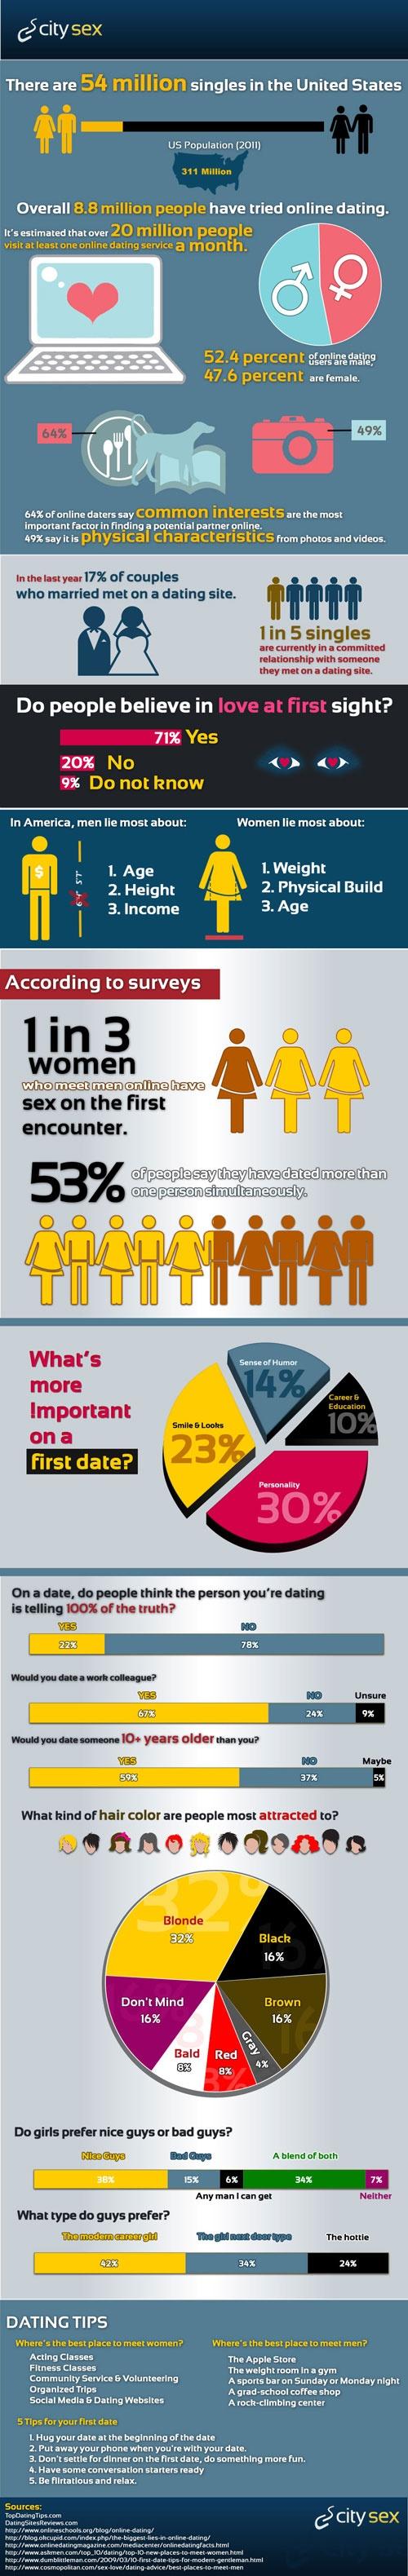 Online Dating Statistics Infographic